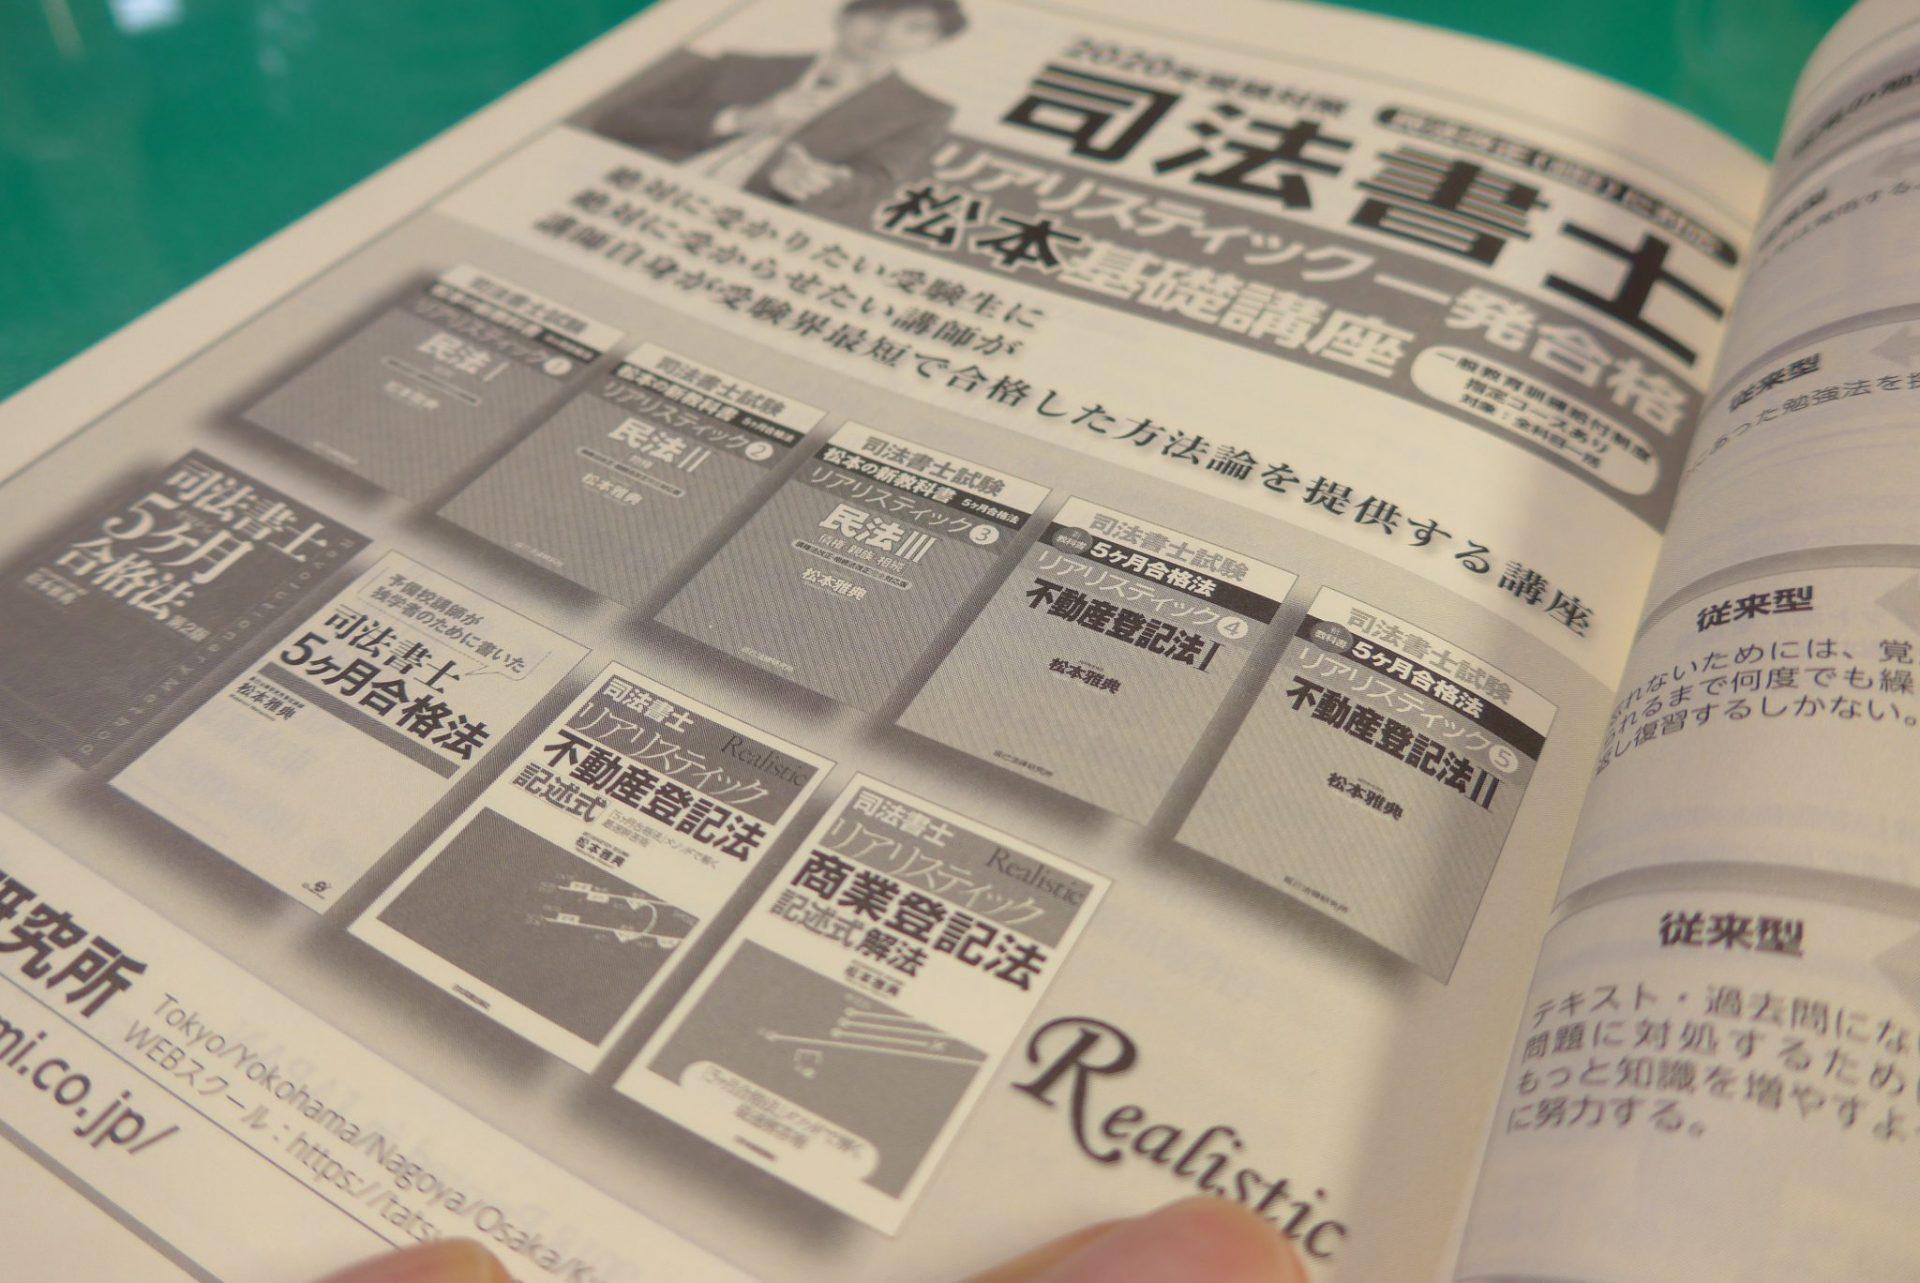 (S)松本雅典リアリスティック民法を購入!民法改正完全対応版